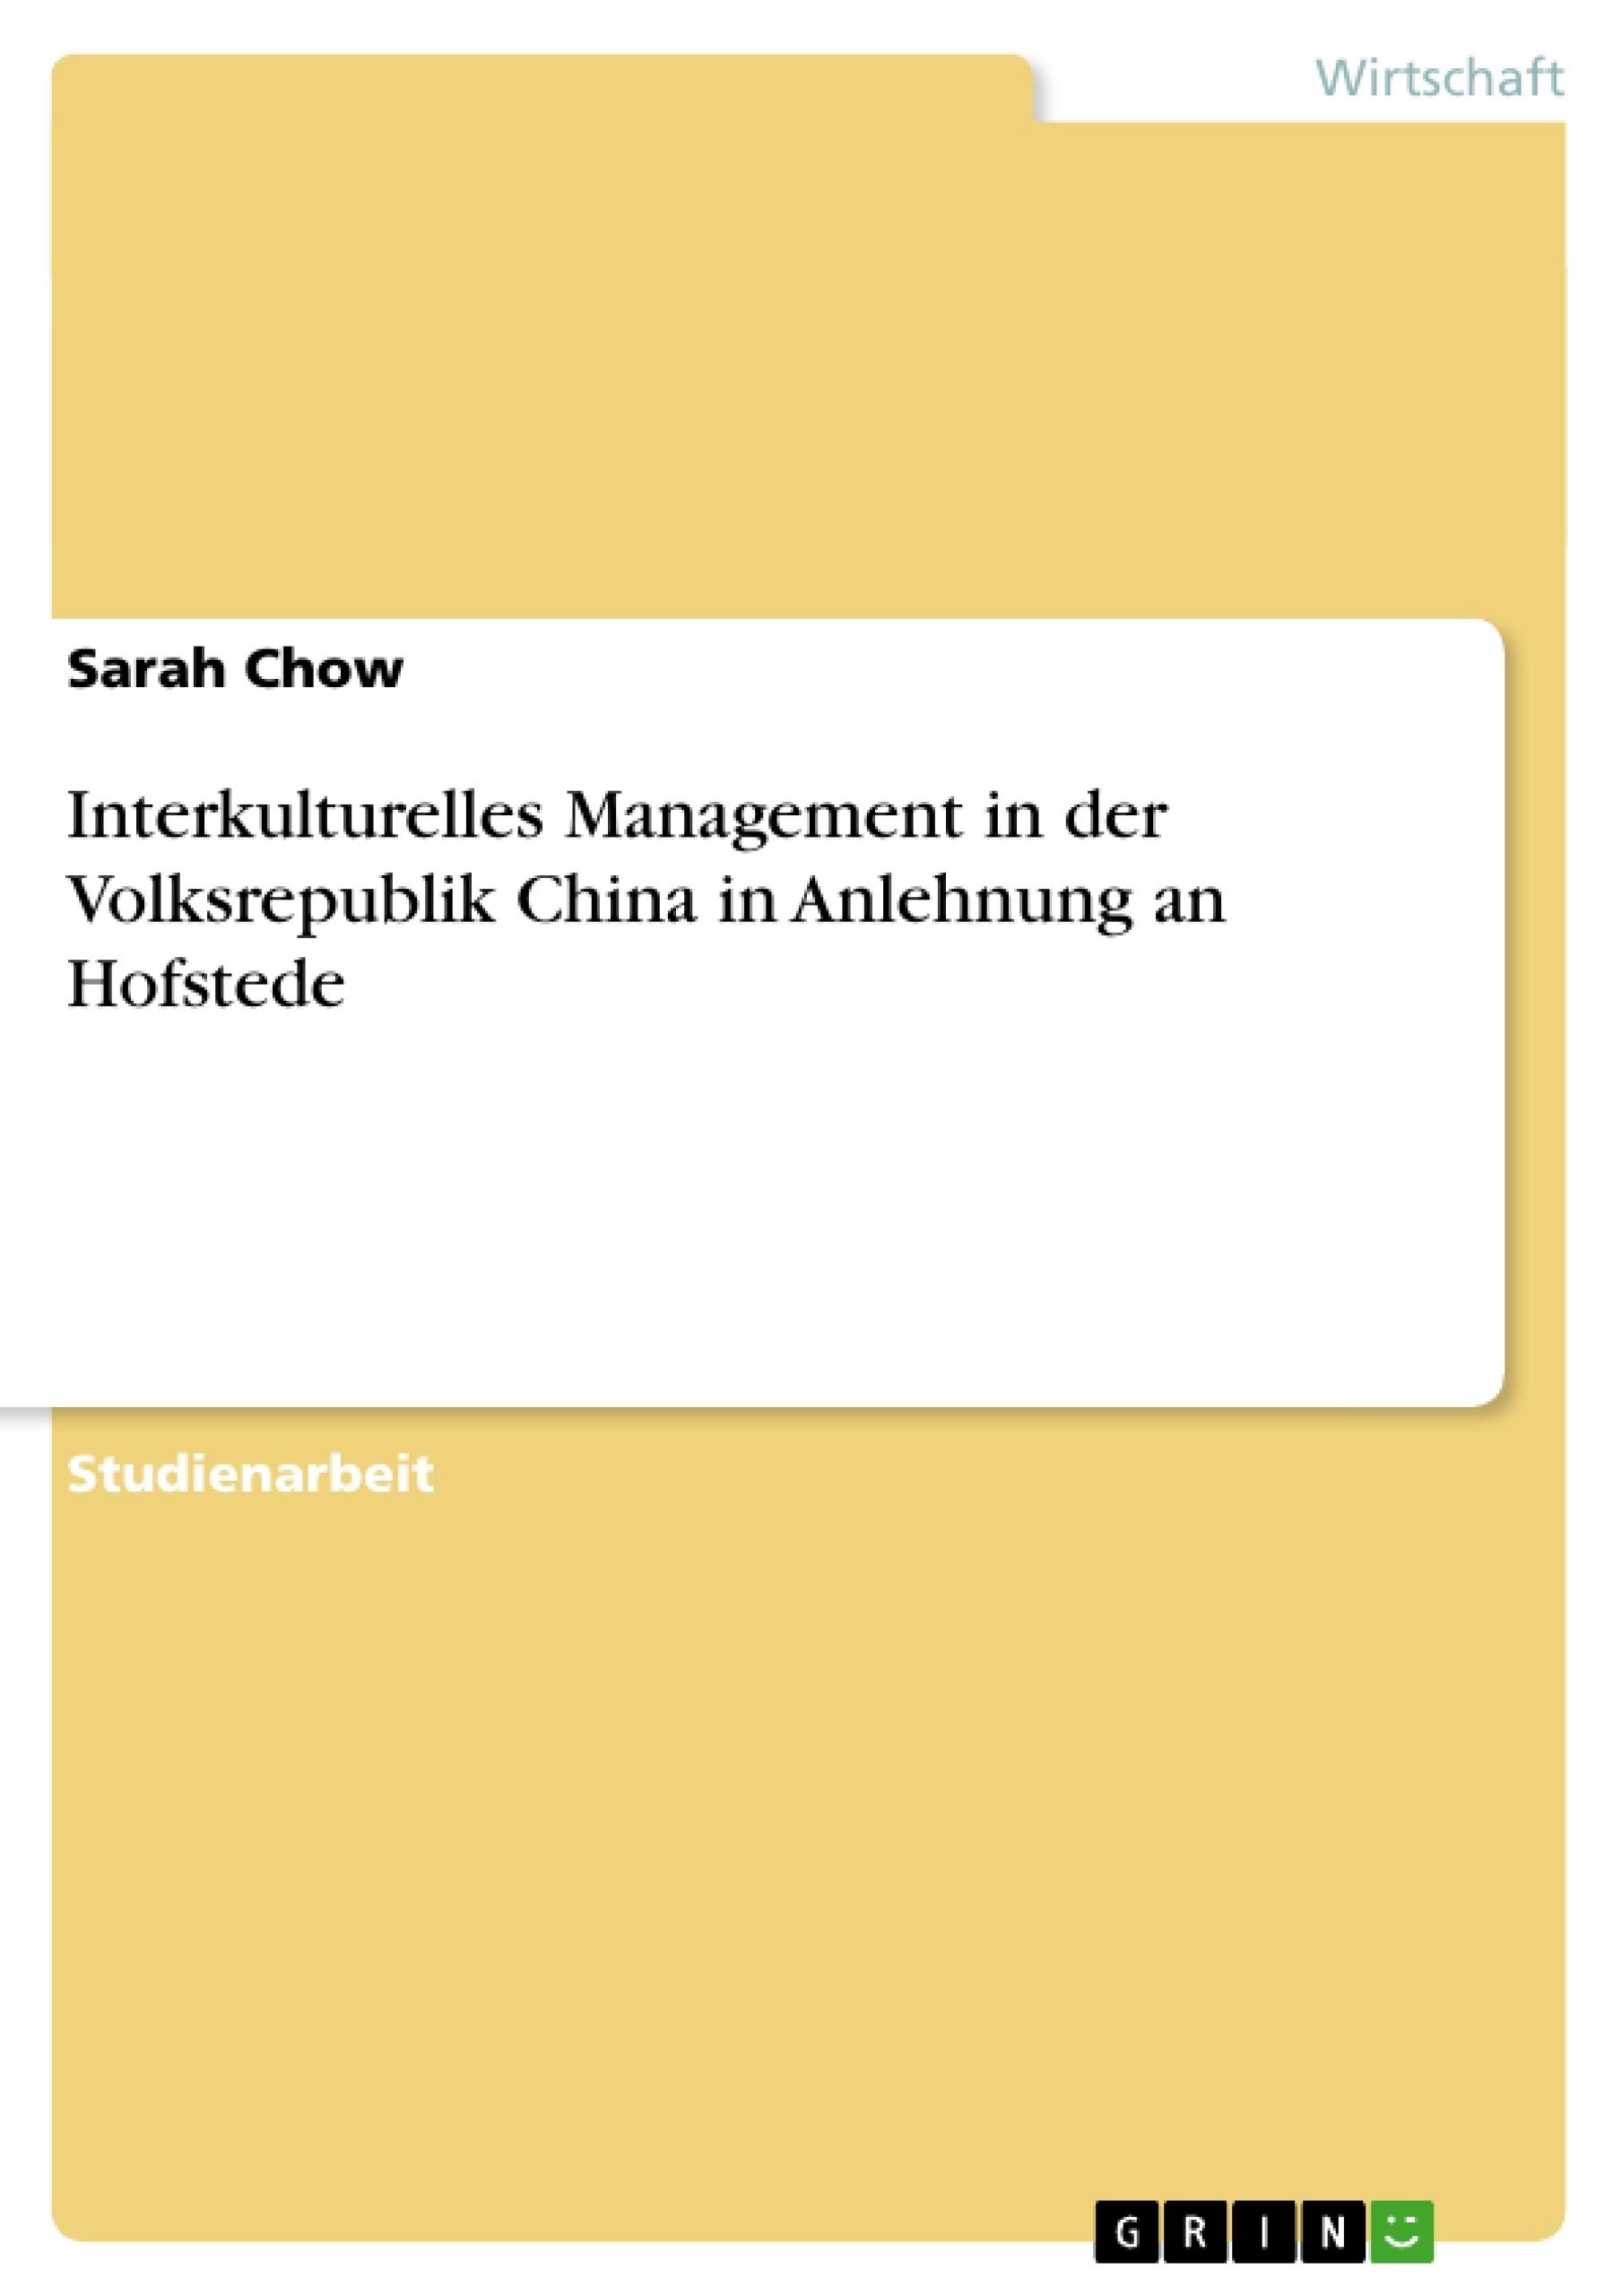 Titel: Interkulturelles Management in der Volksrepublik China in Anlehnung an Hofstede